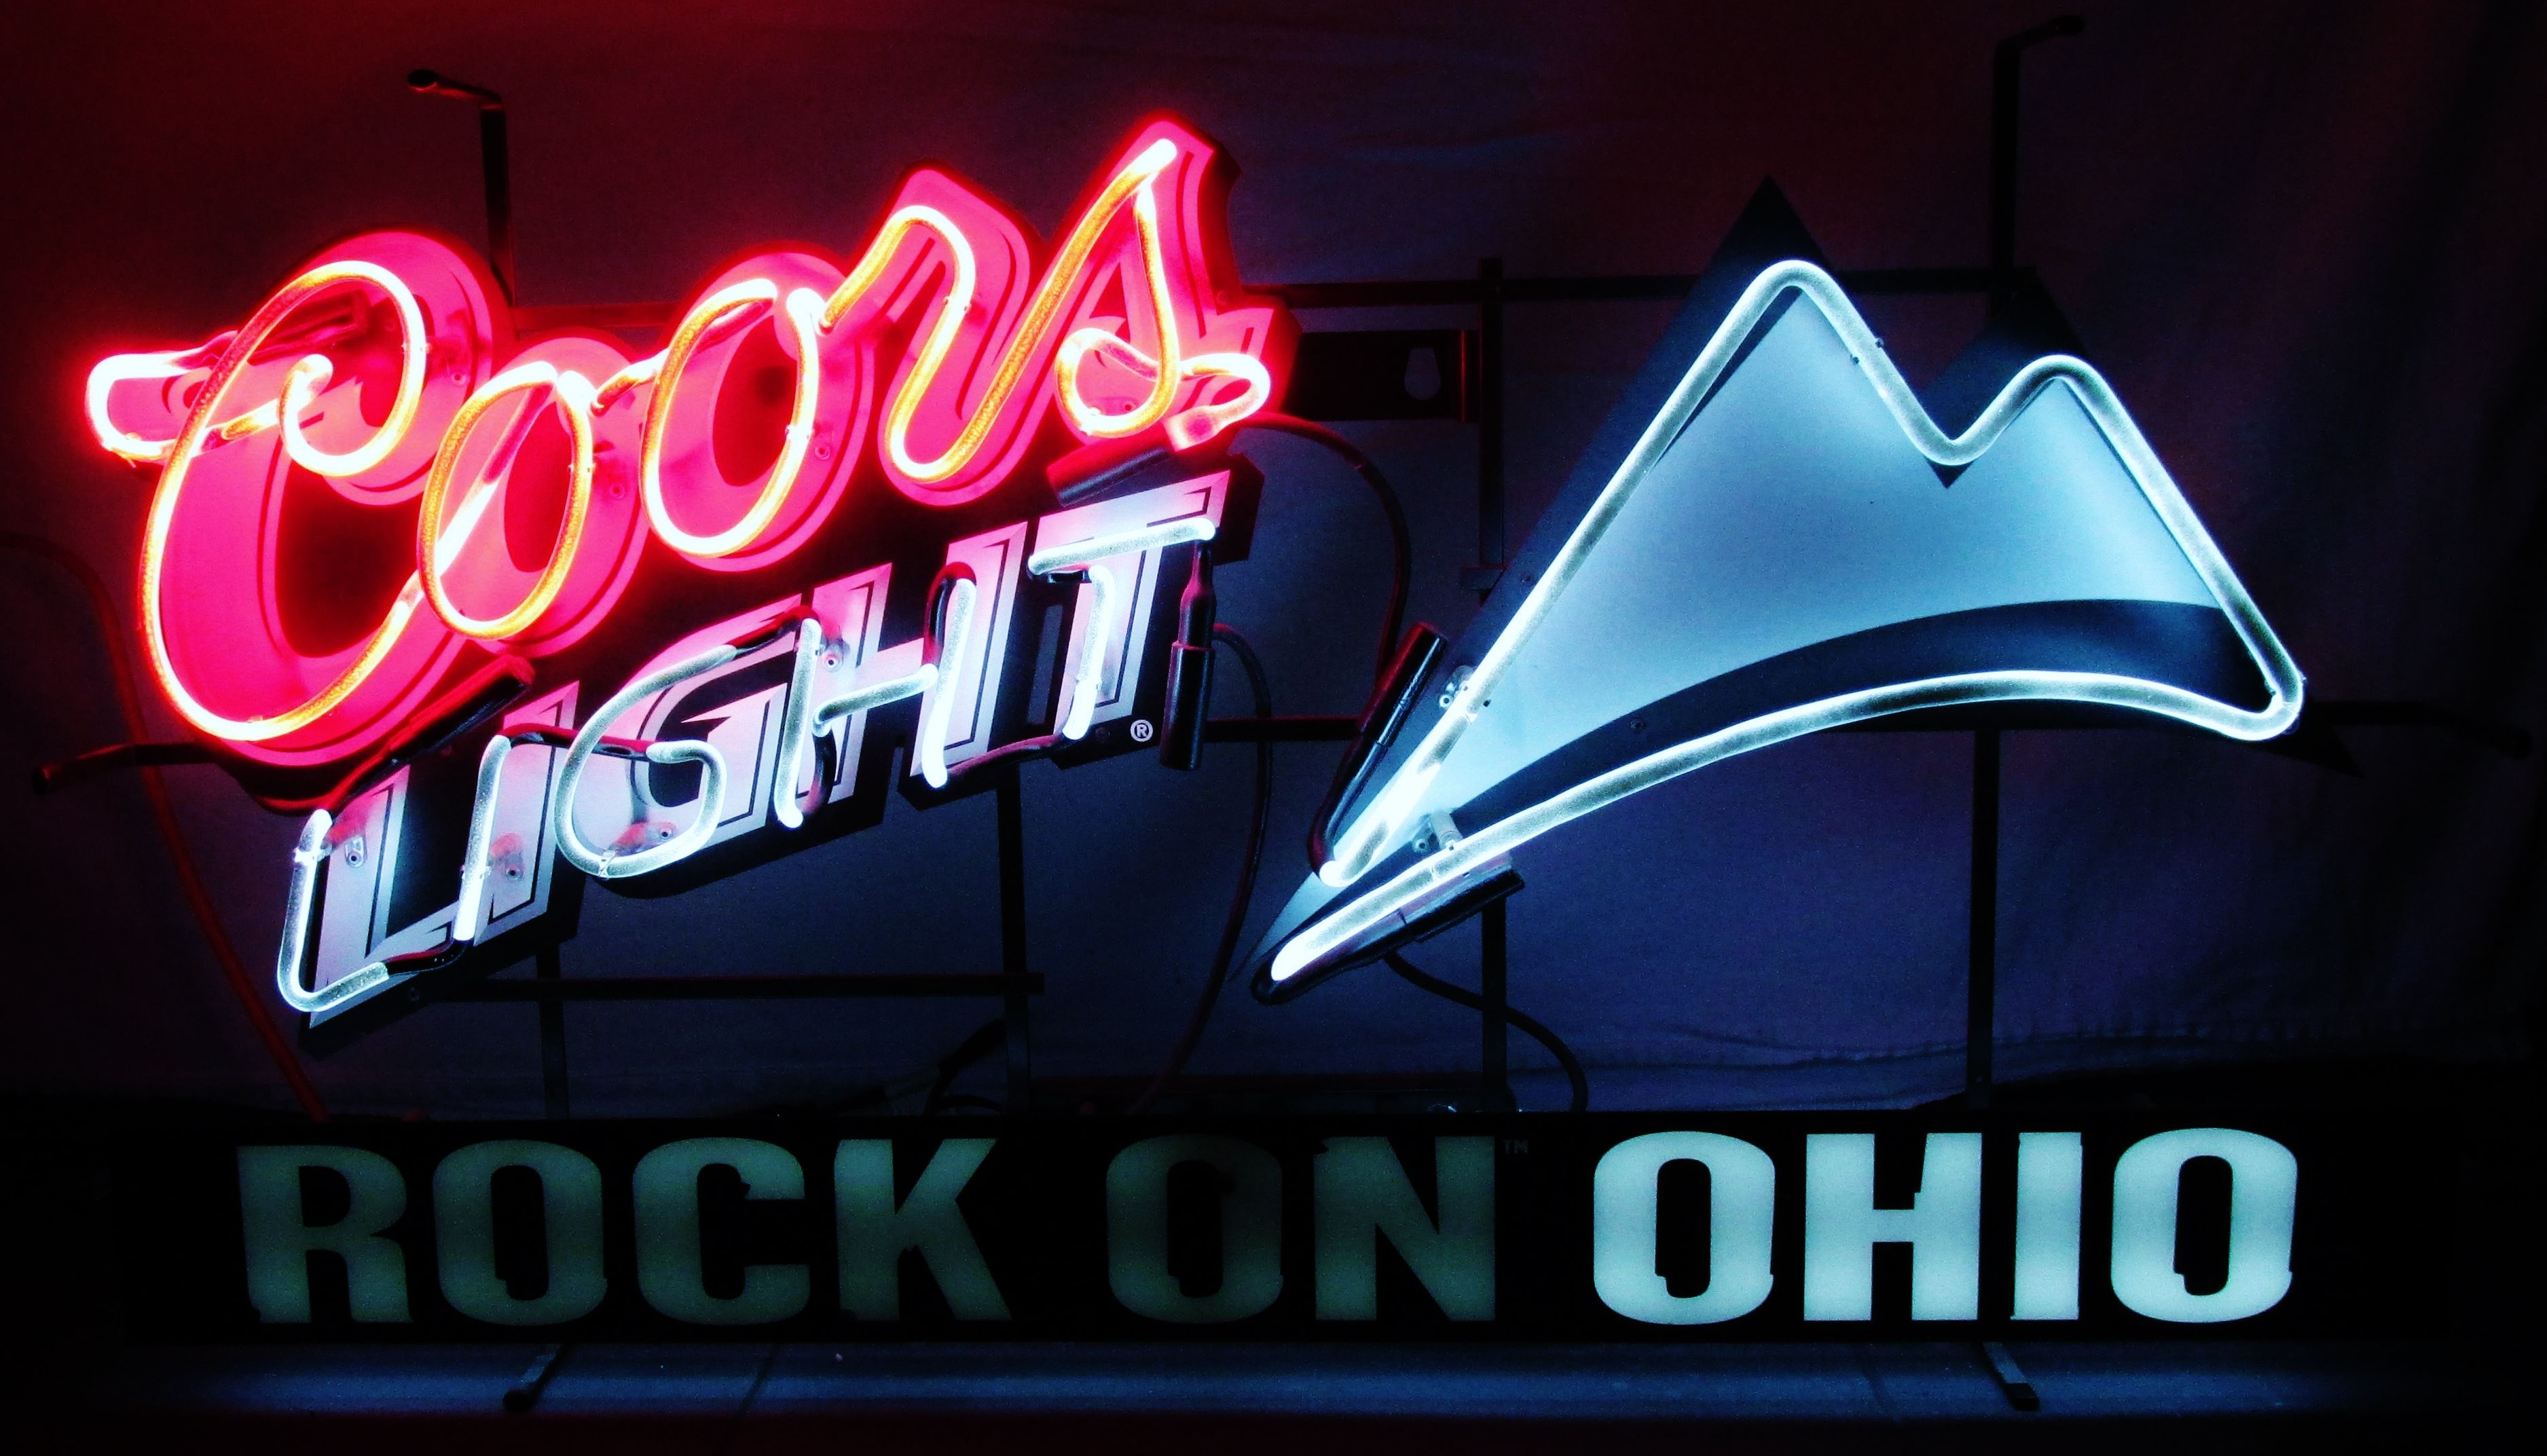 coors light rock on ohio neon bar sign circa 2006. Black Bedroom Furniture Sets. Home Design Ideas